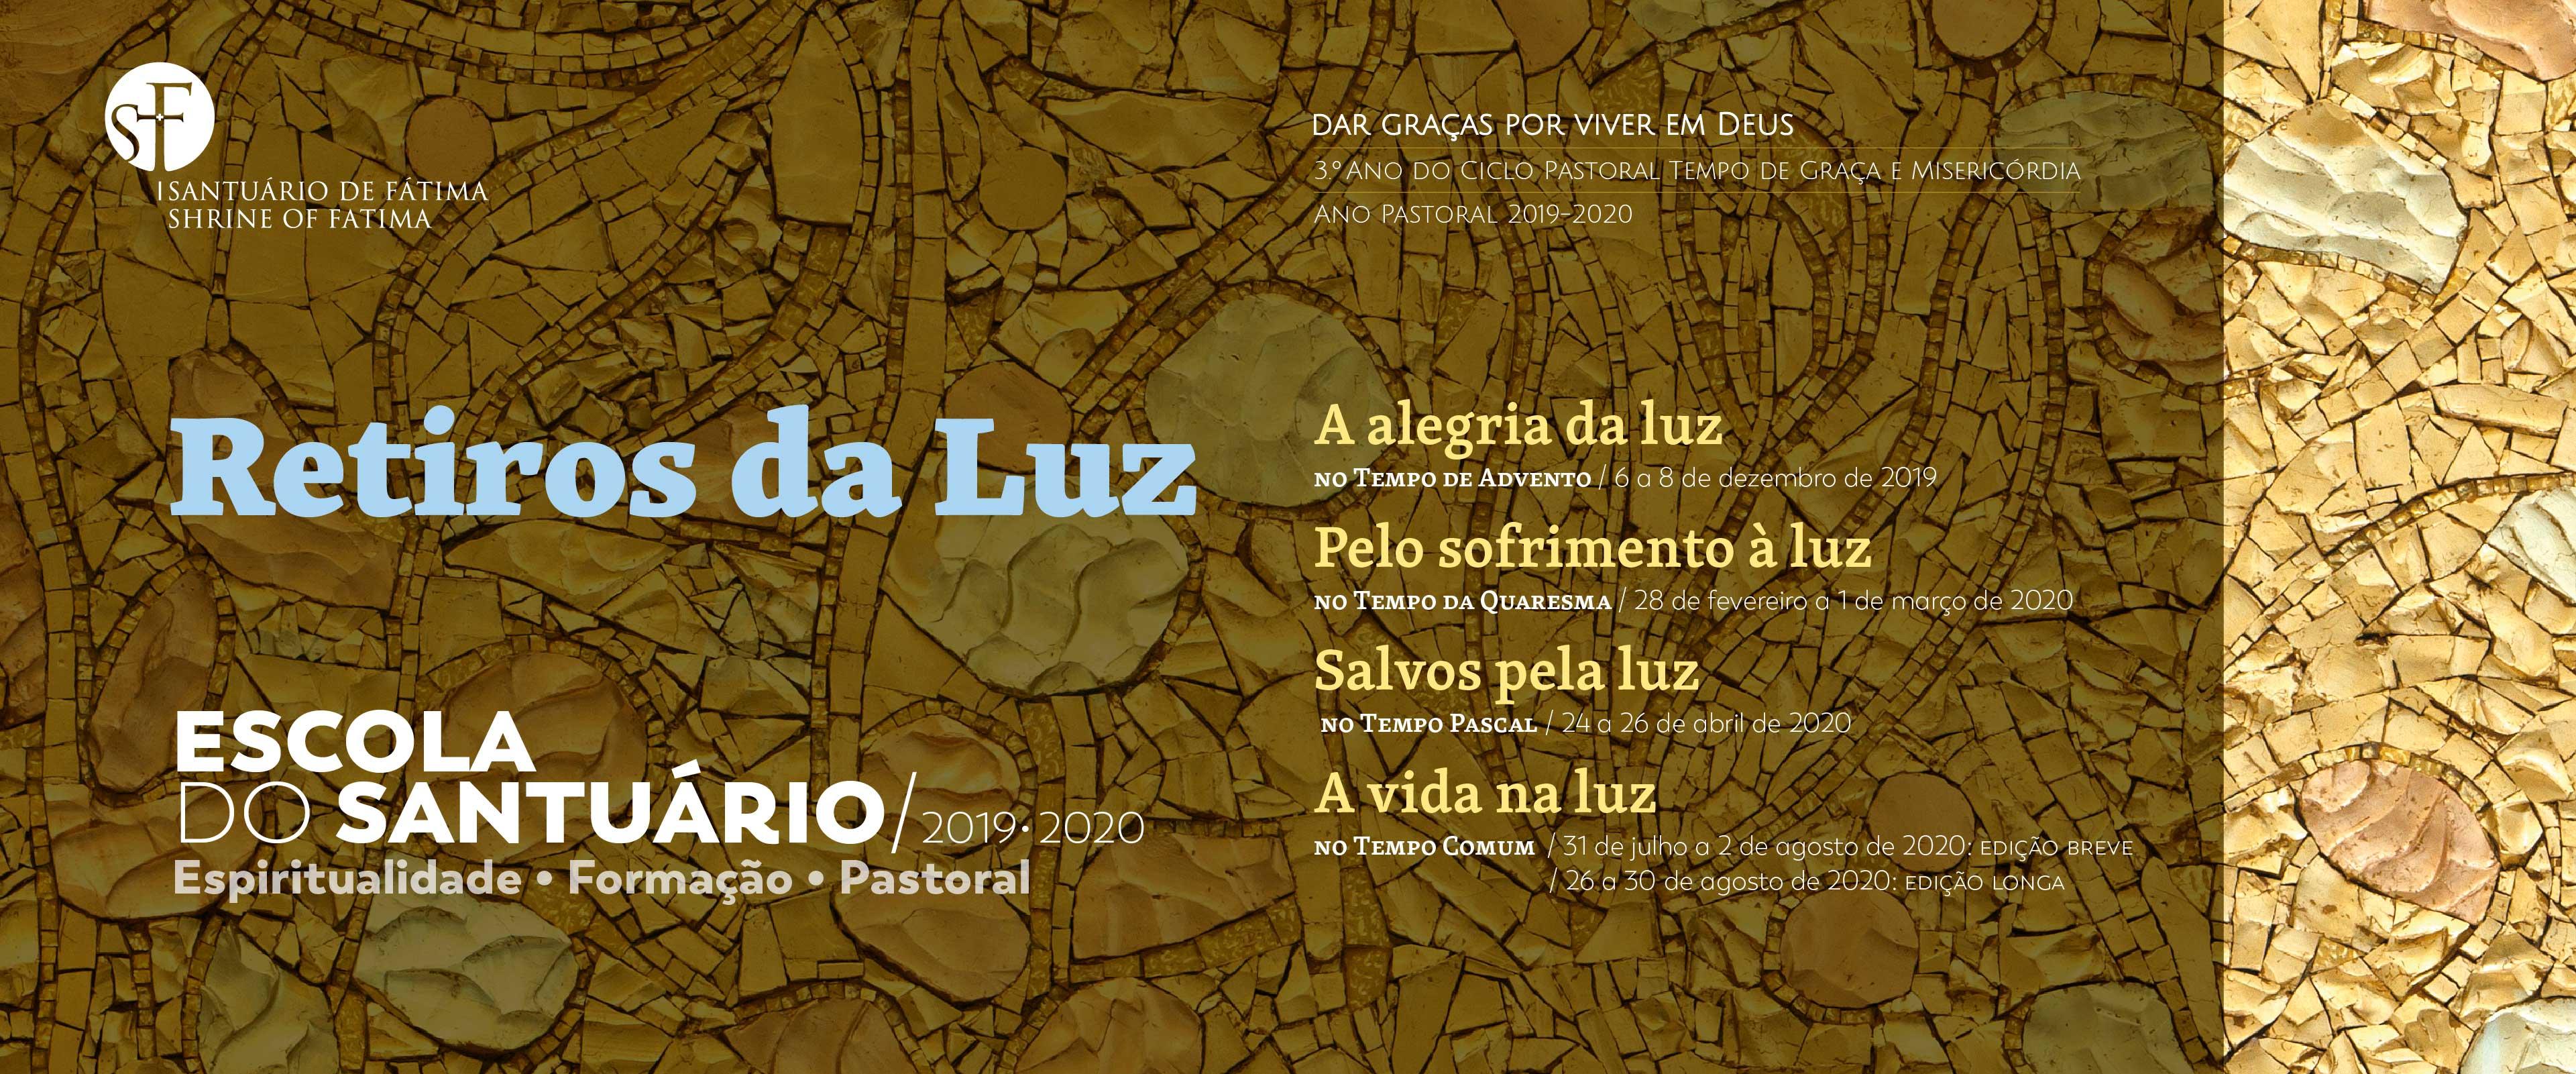 AF_BANNER_Retiros da Luz_GERAL.jpg.jpg